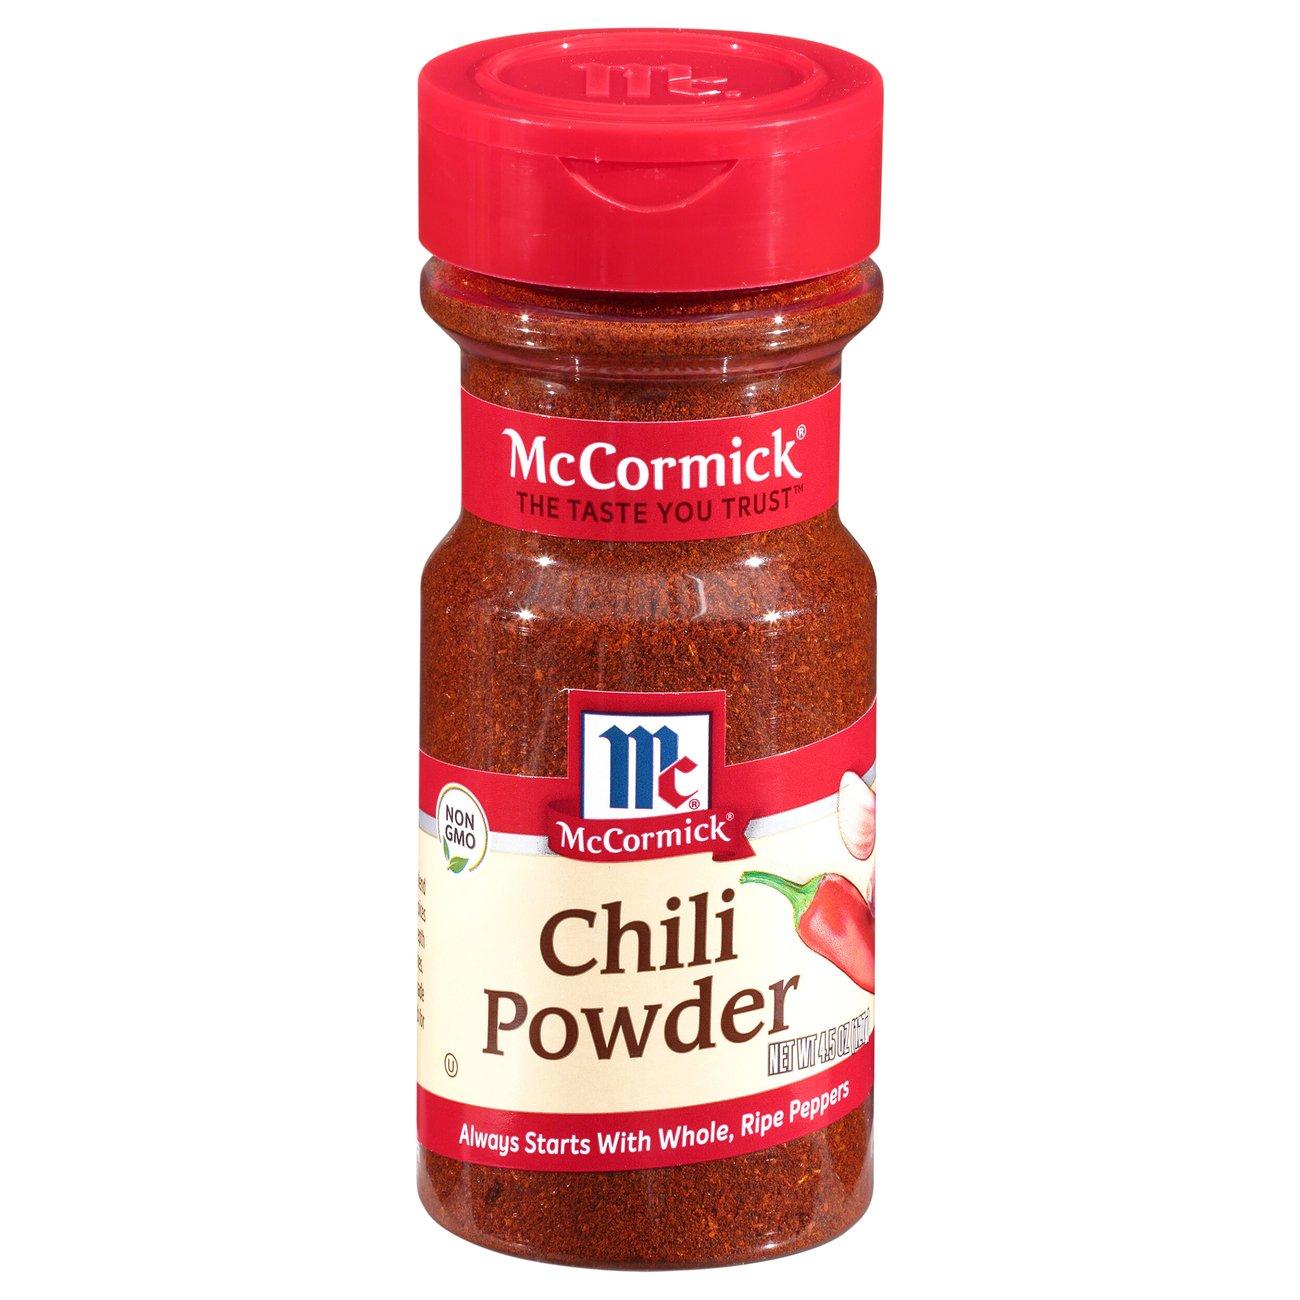 Mccormick Chili Powder Shop Herbs Spices At H E B